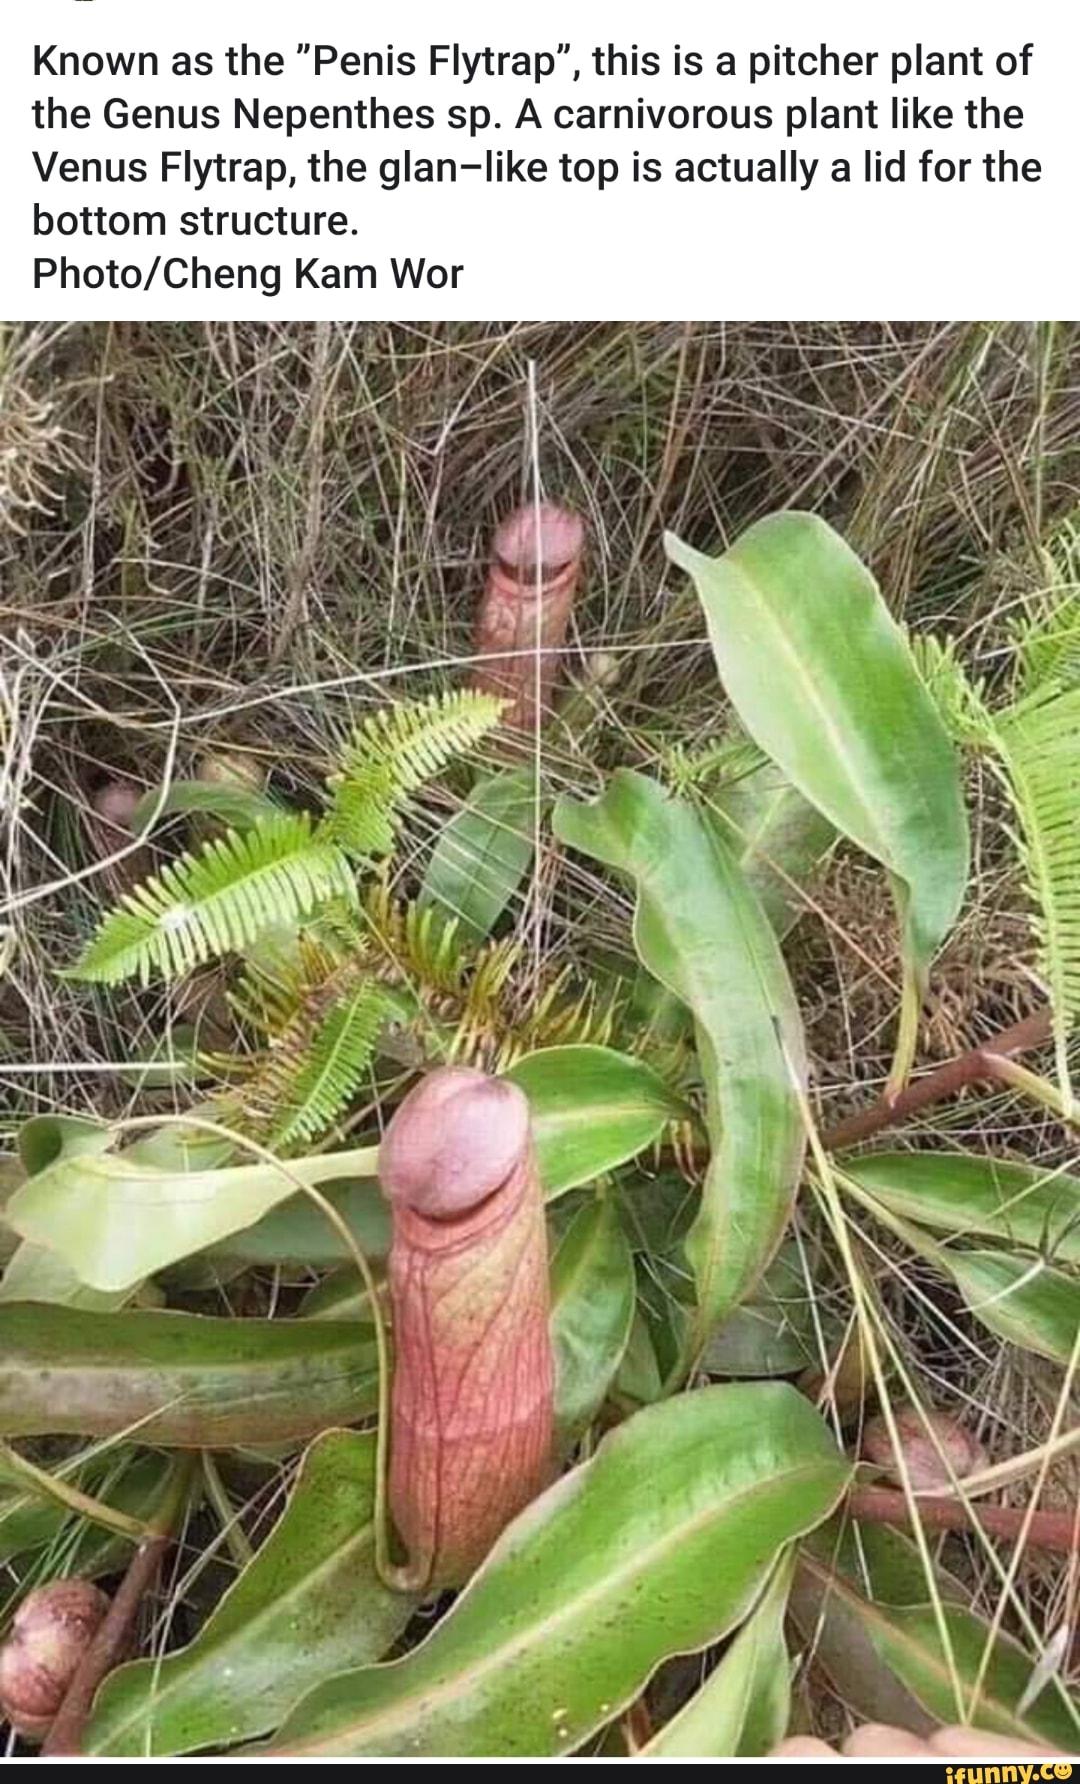 Pitcher plant or penis flytrap